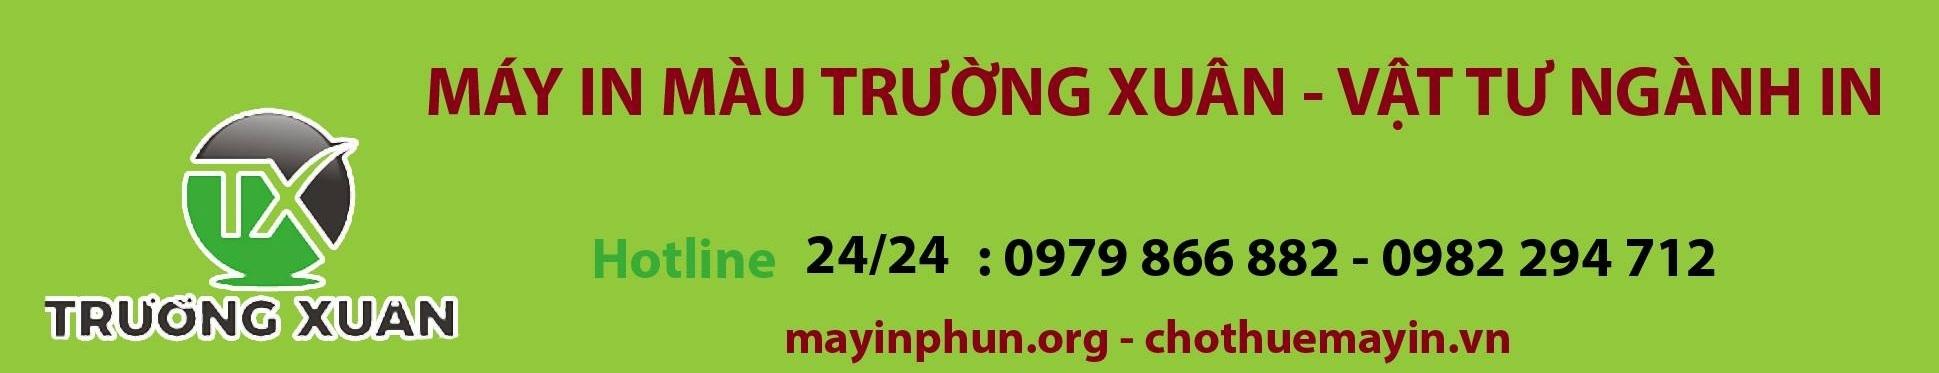 http://mayinphun.org